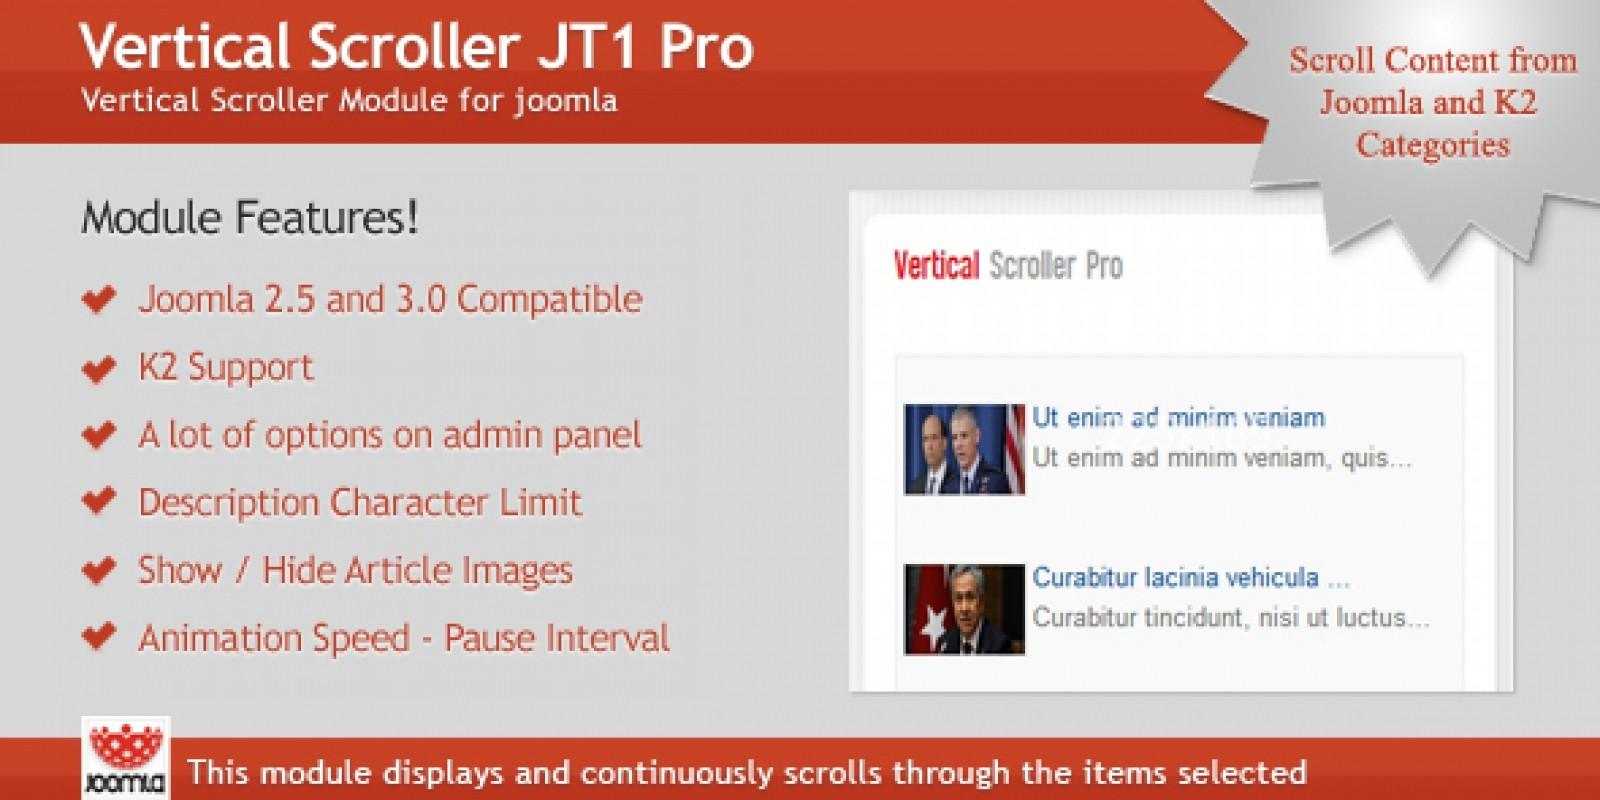 Vertical Scroller JT1 Pro - Joomla Module